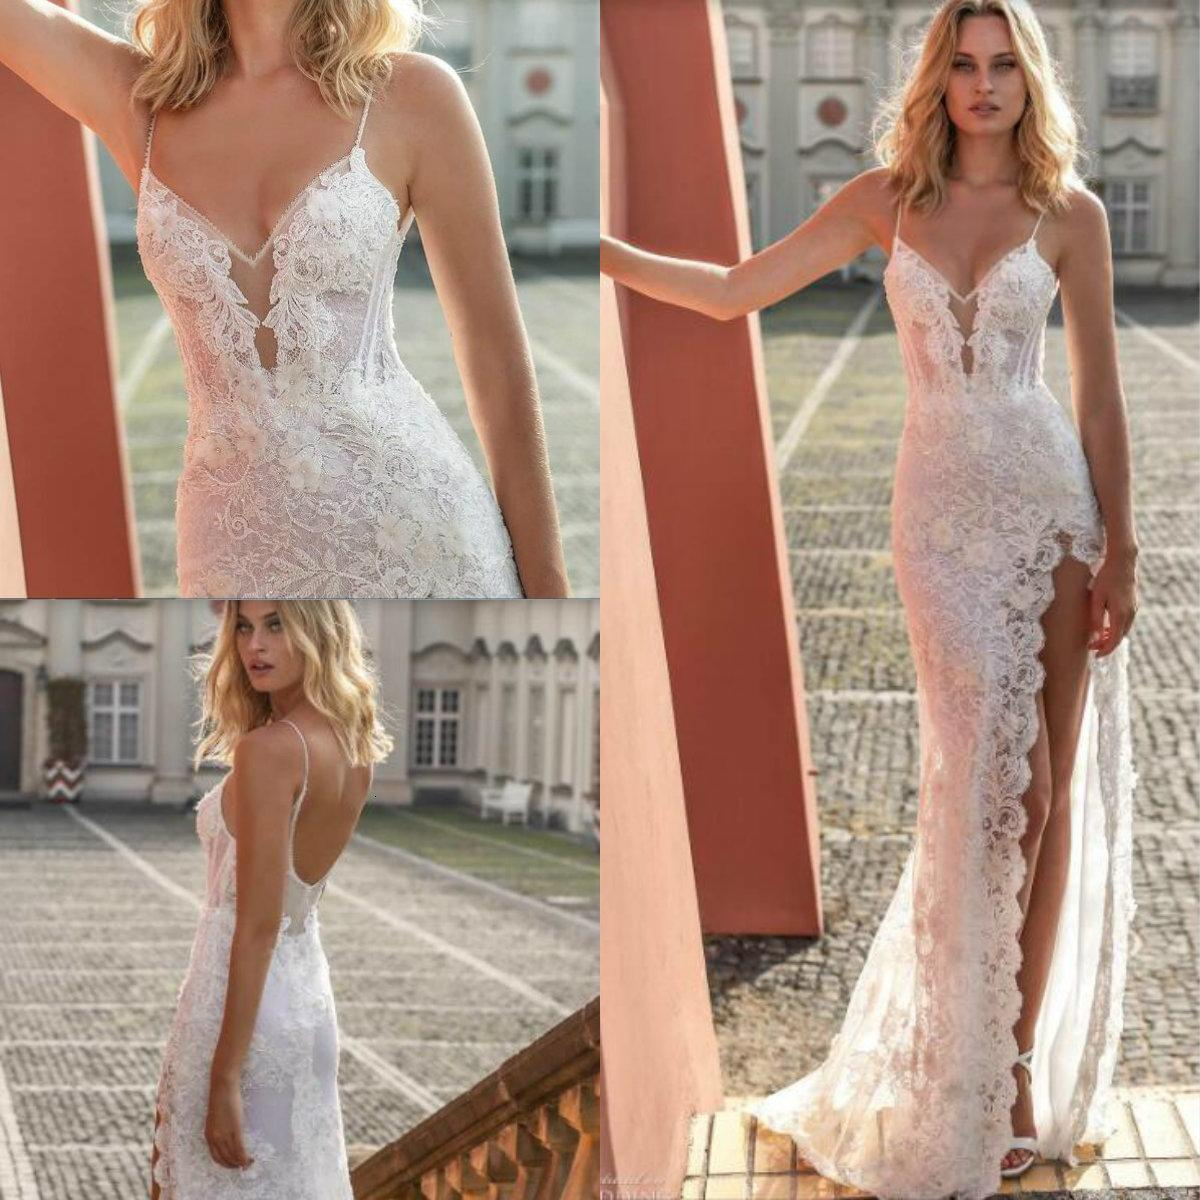 2020 spaghetti beach robes de mariée cuisse haute dentelle fente 3D floral appliques sirène robe de mariée robe sans dos sexy boho robe de mariée